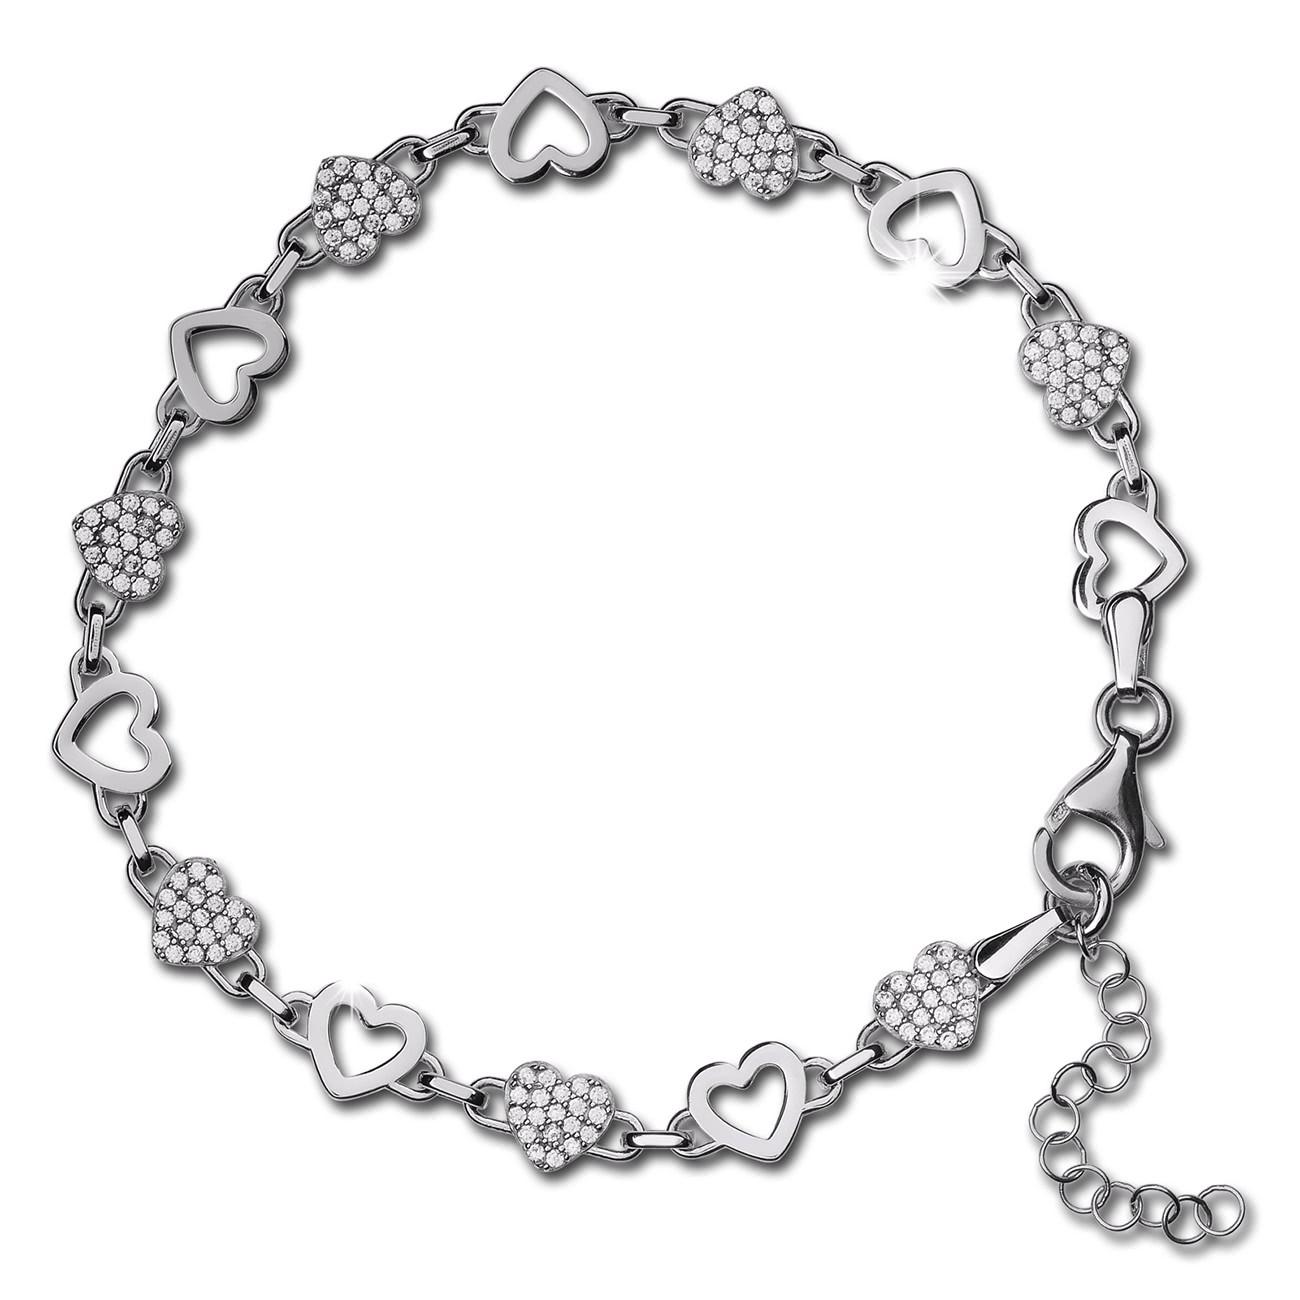 SilberDream Armband Herzen 925 Silber poliert Zirkonia ca. 21,5cm SDA4798W